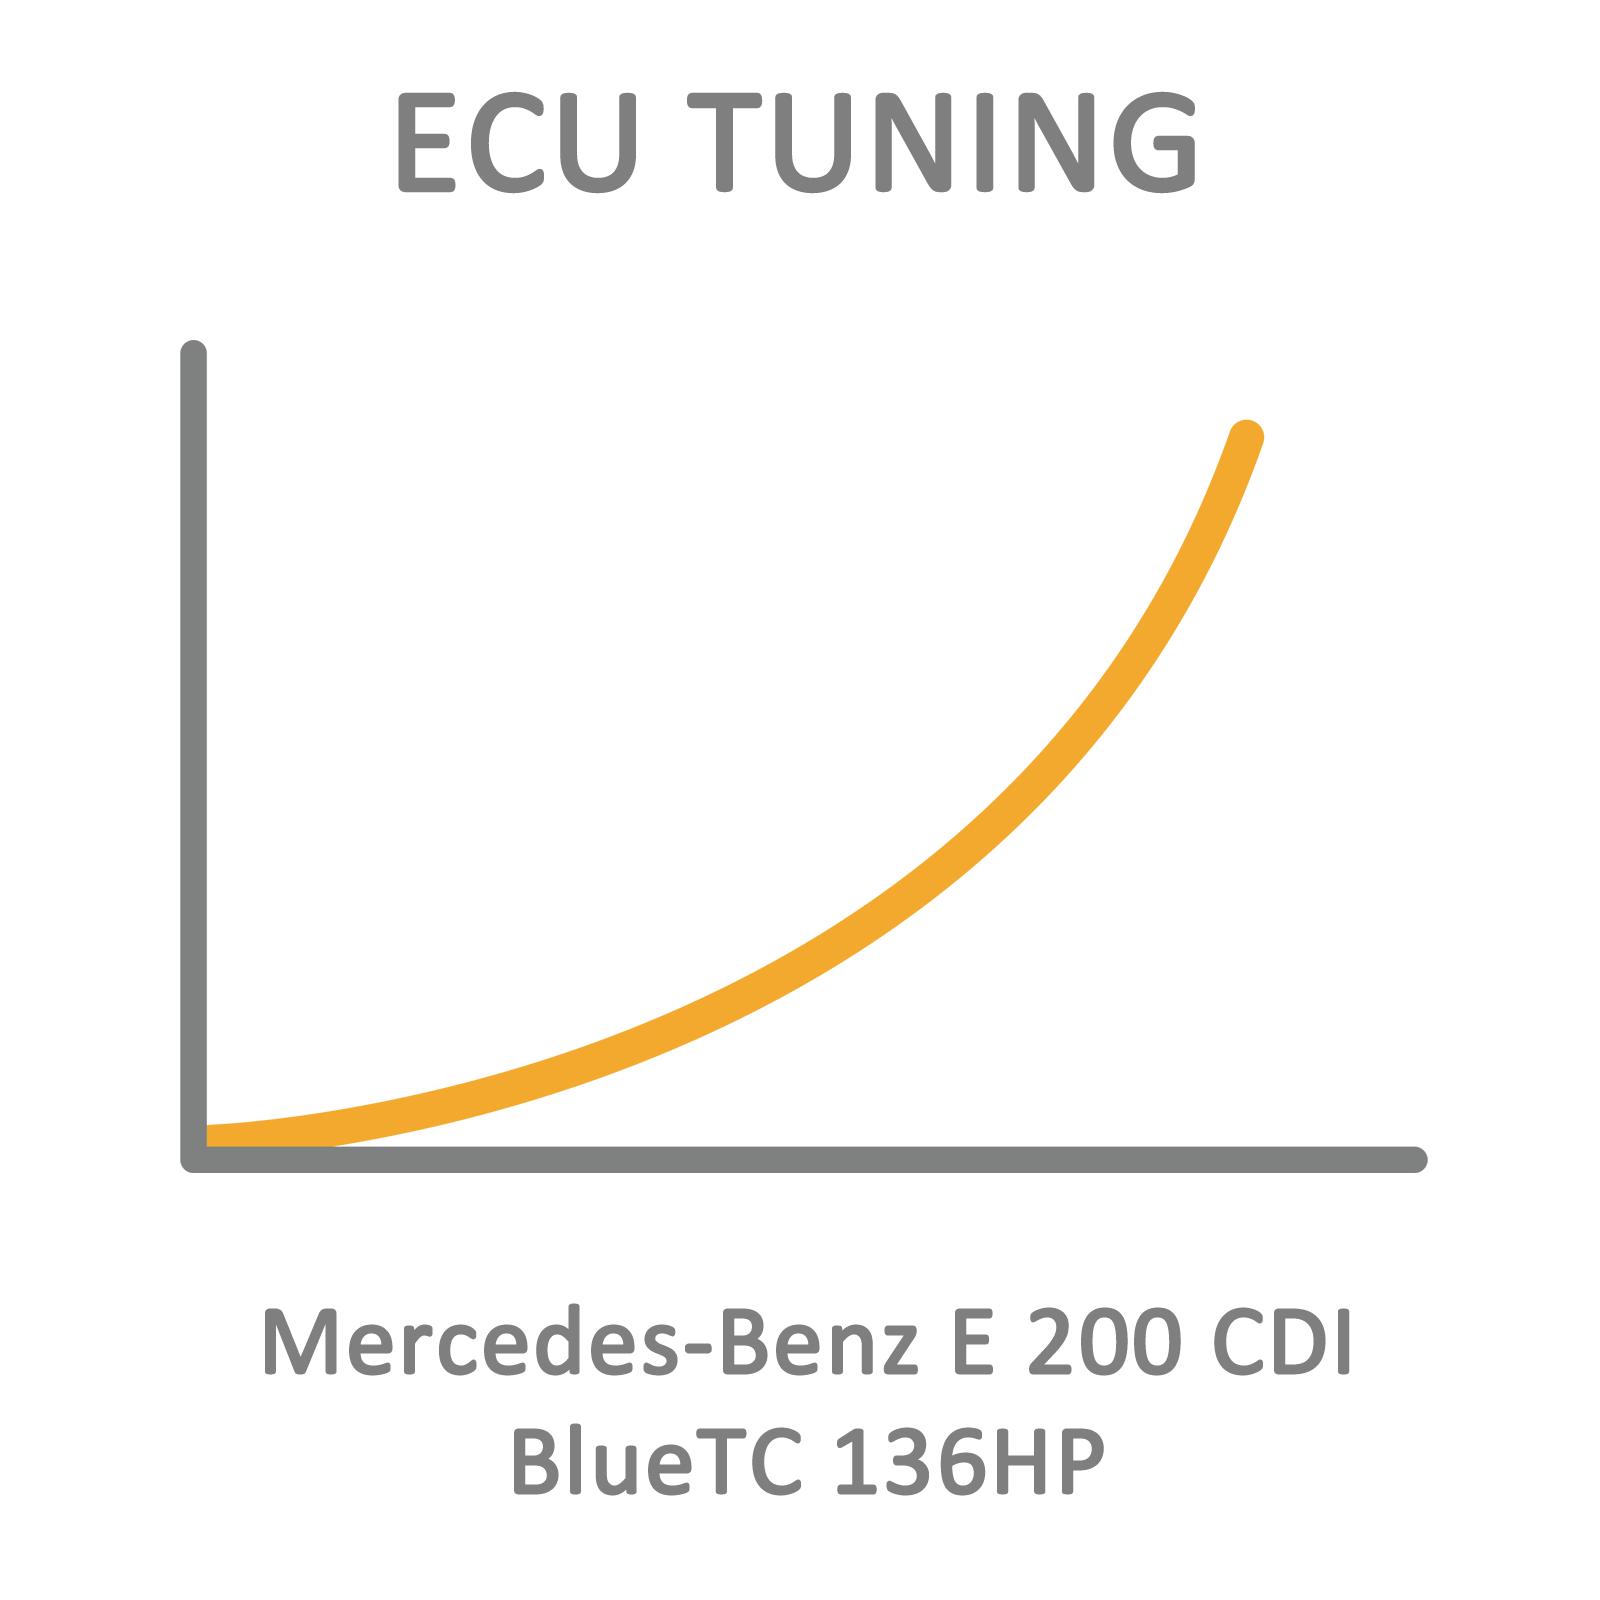 Mercedes-Benz E 200 CDI BlueTC 136HP ECU Tuning Remapping